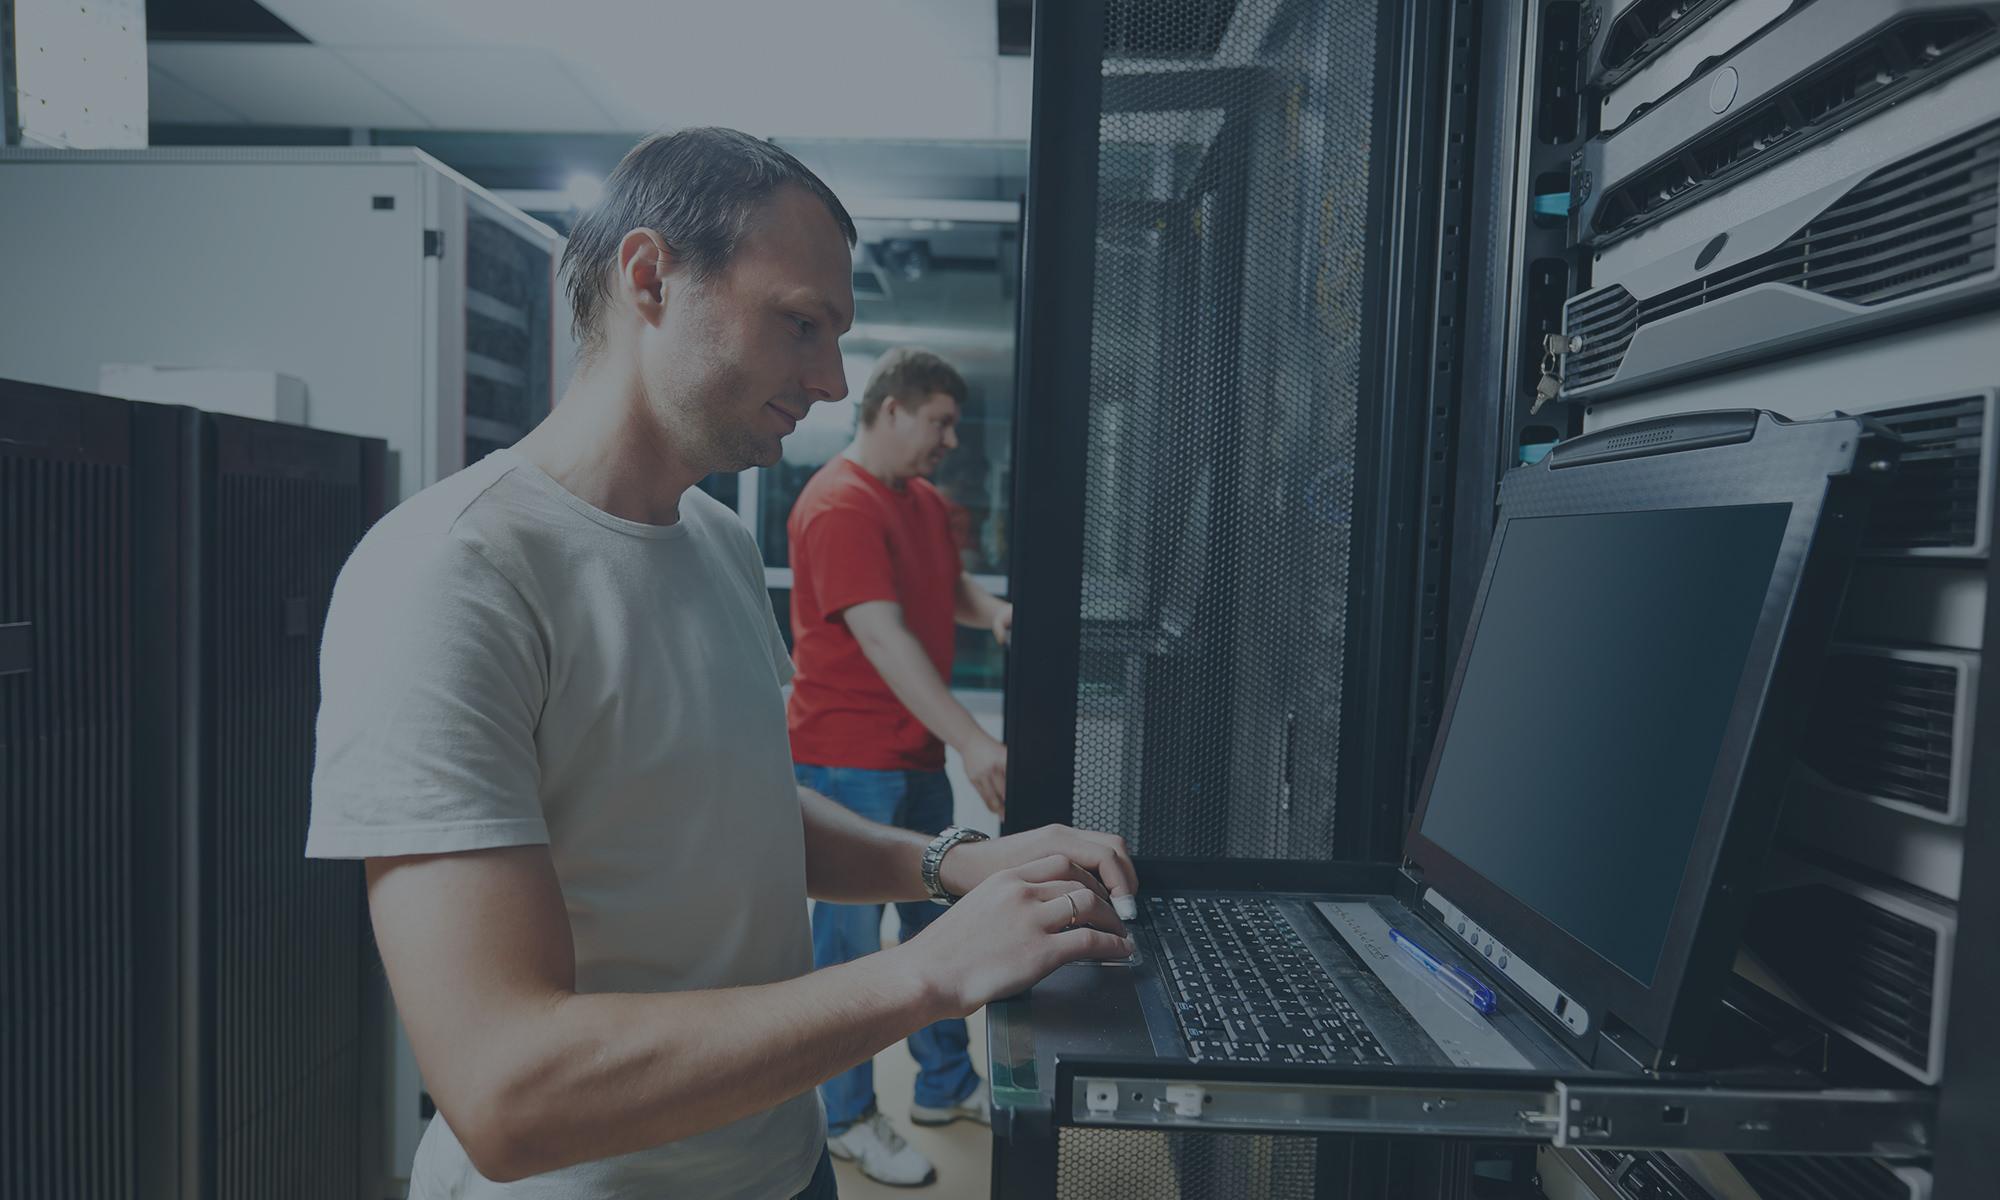 Man typing on laptop in server room